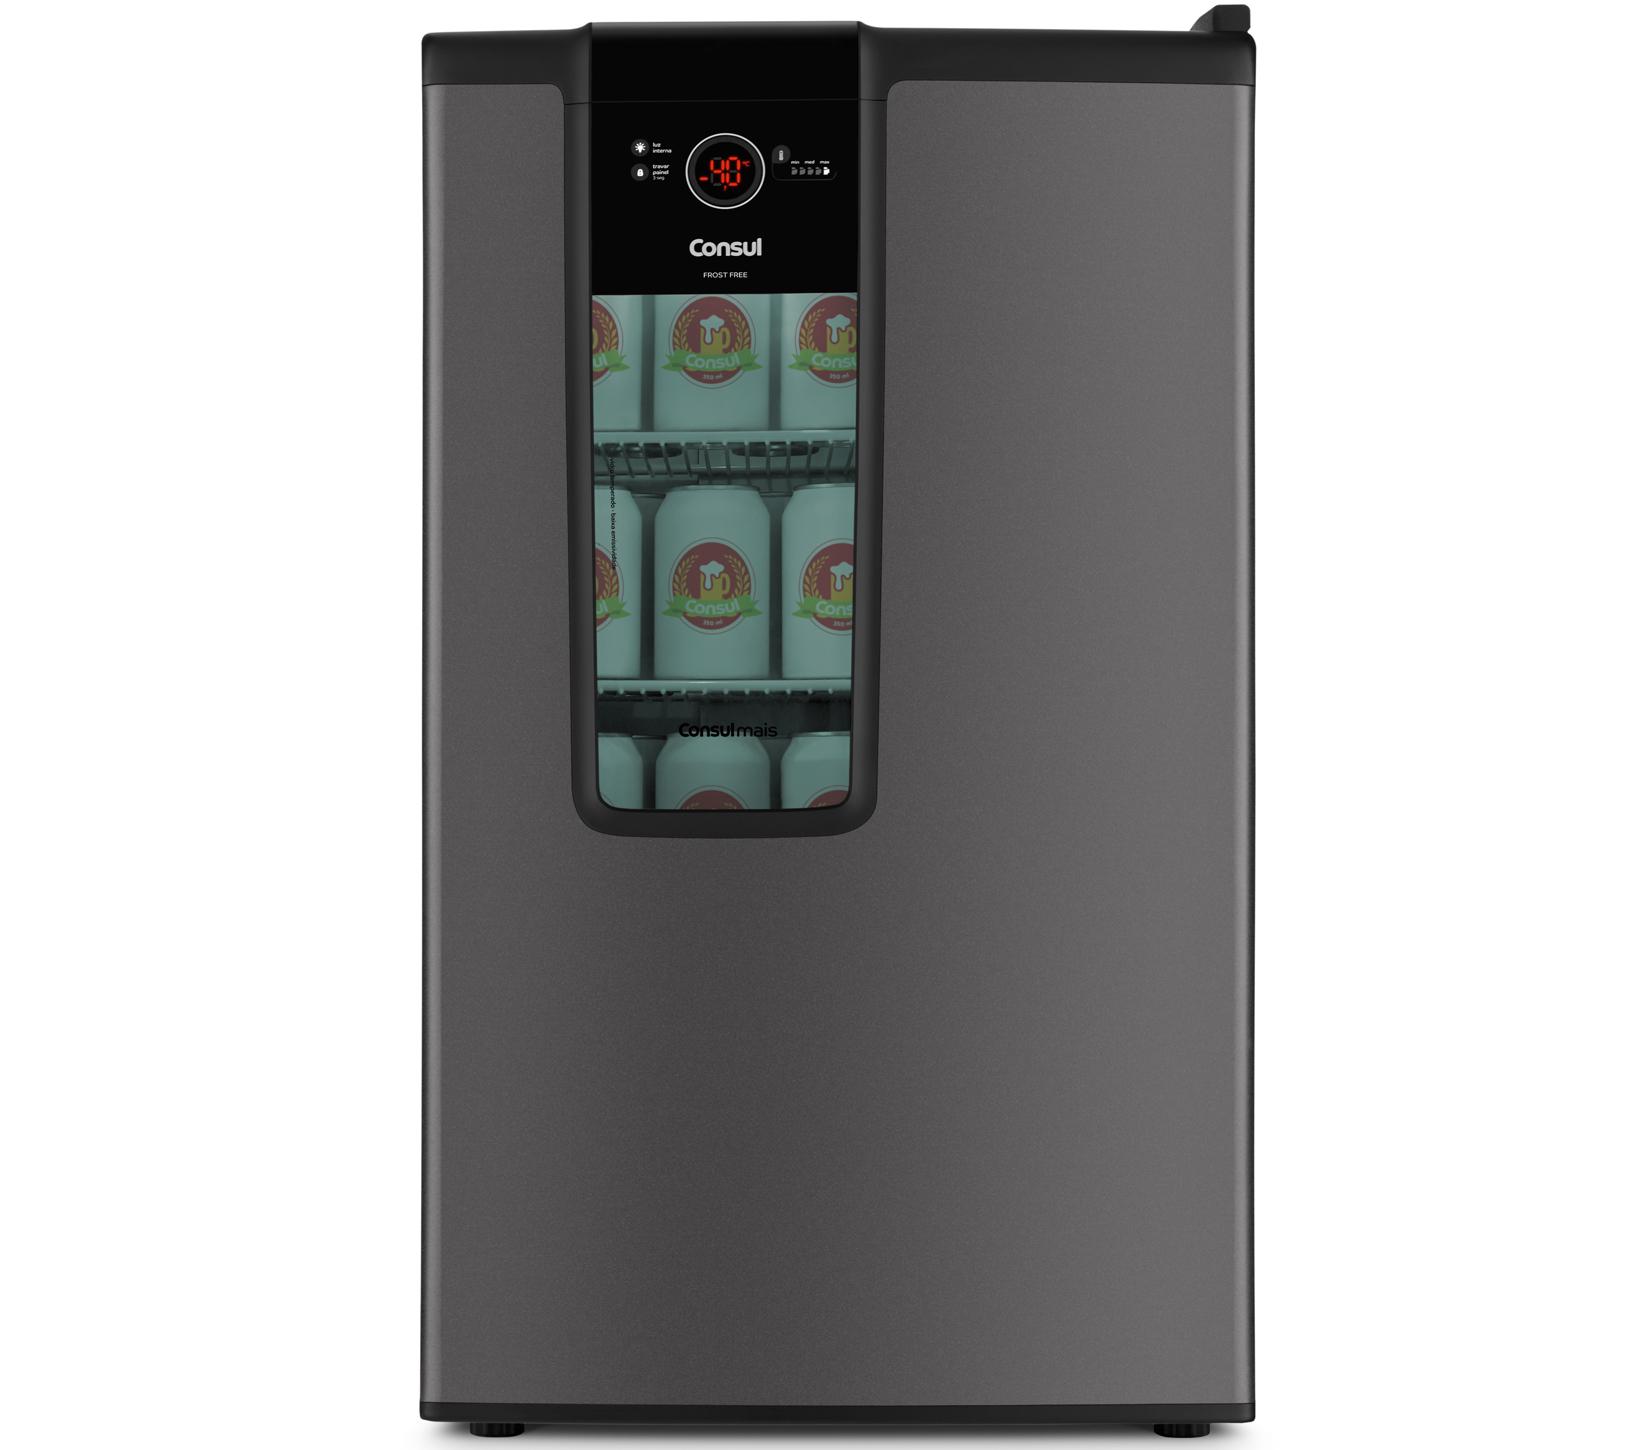 Cervejeira Consul Frost Free Titanium 127V 82L CZD12AT com Painel Touch